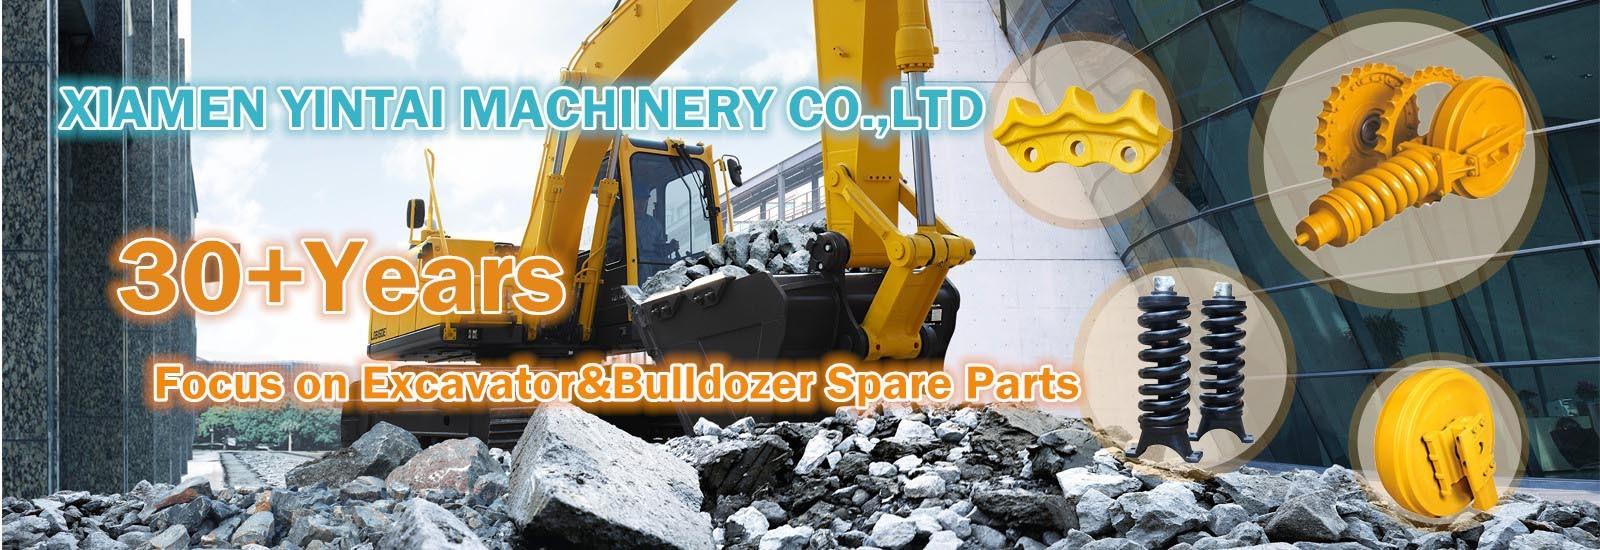 XIAMEN YINTAI MACHINERY CO , LTD  - China Excavator Undercarriage